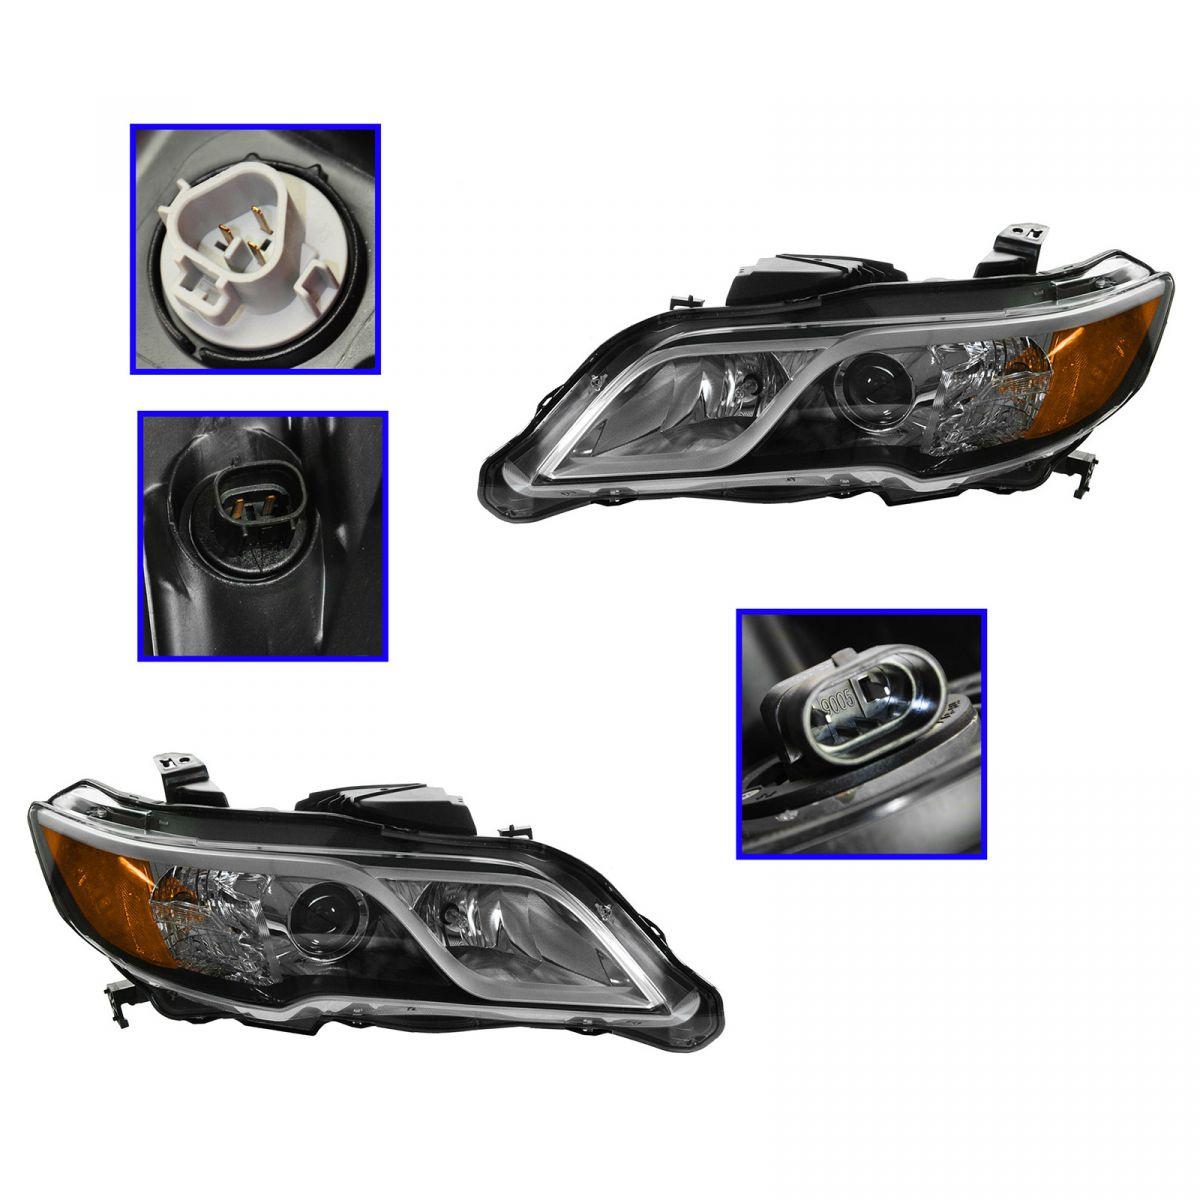 HID Xenon Headlight Headlamp Pair Set For 13 Acura RDX NEW